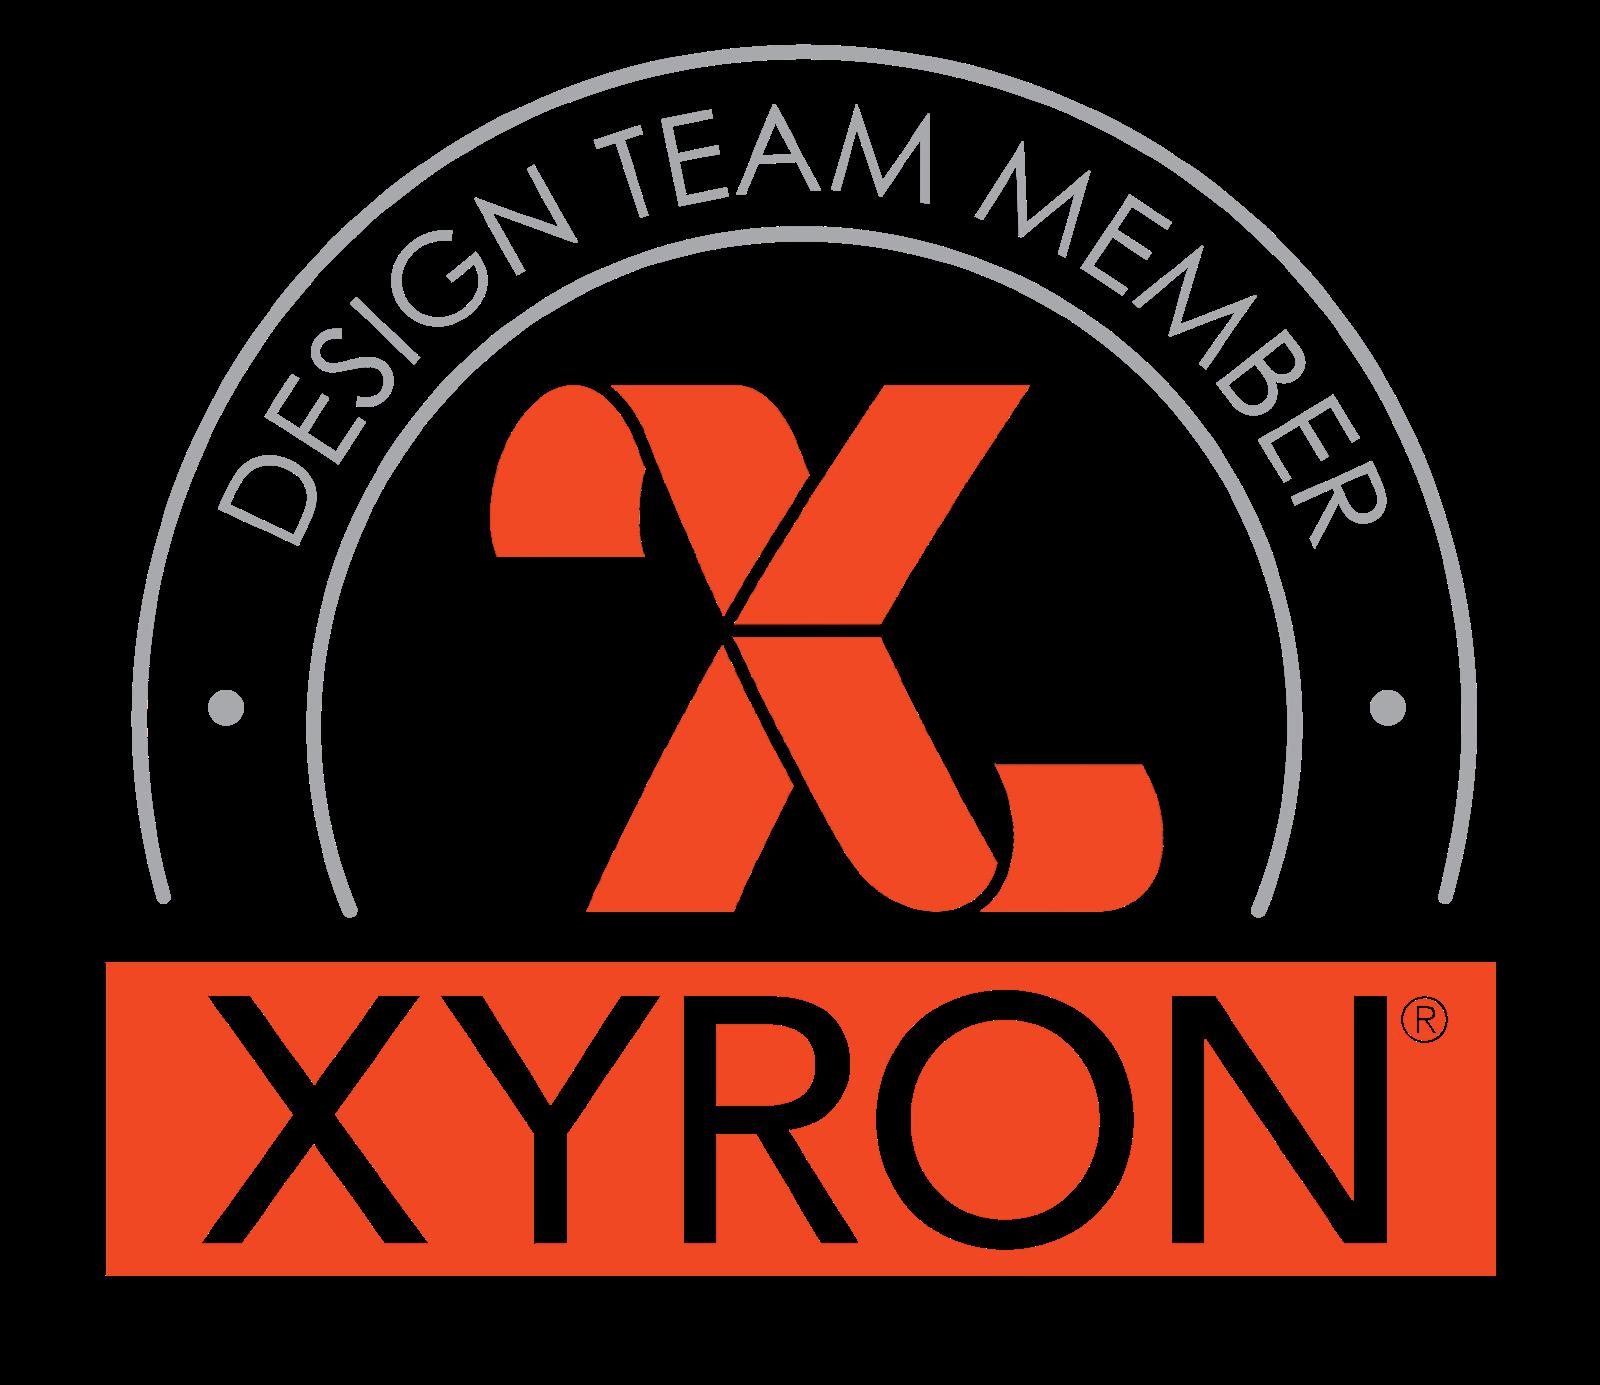 Xyron DT